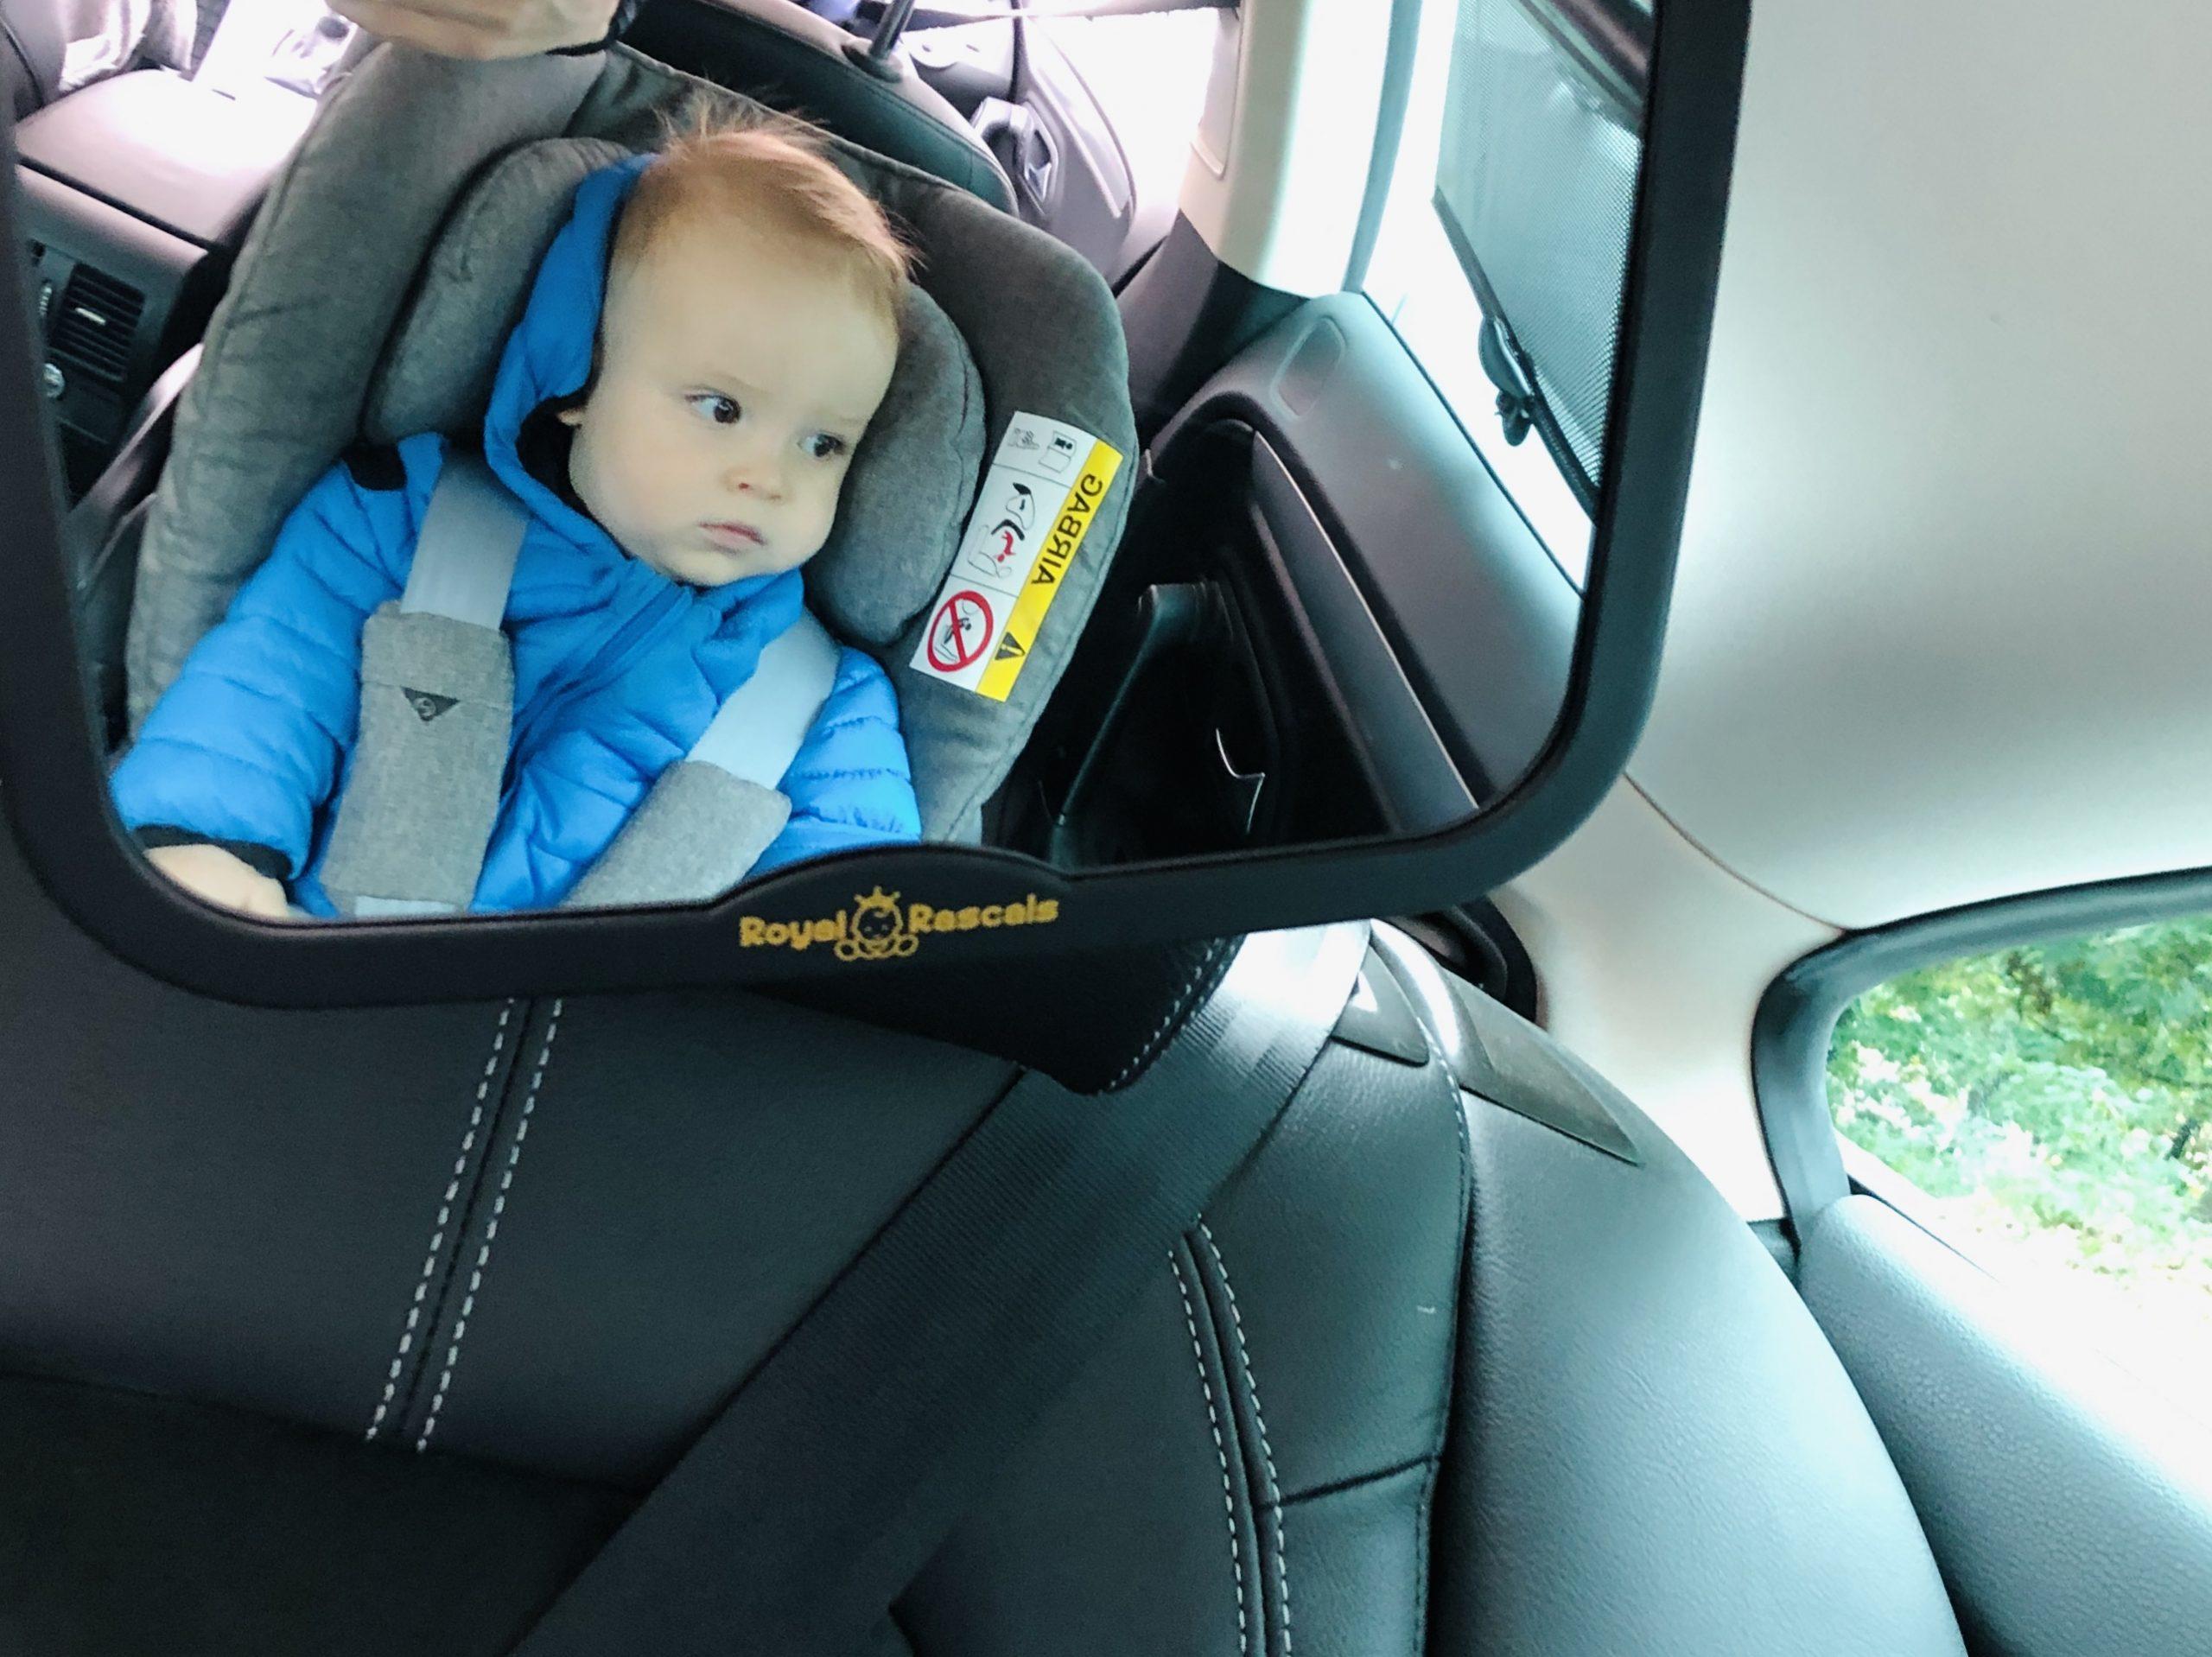 Spätné zrkadlo do auta - Royal Rascals